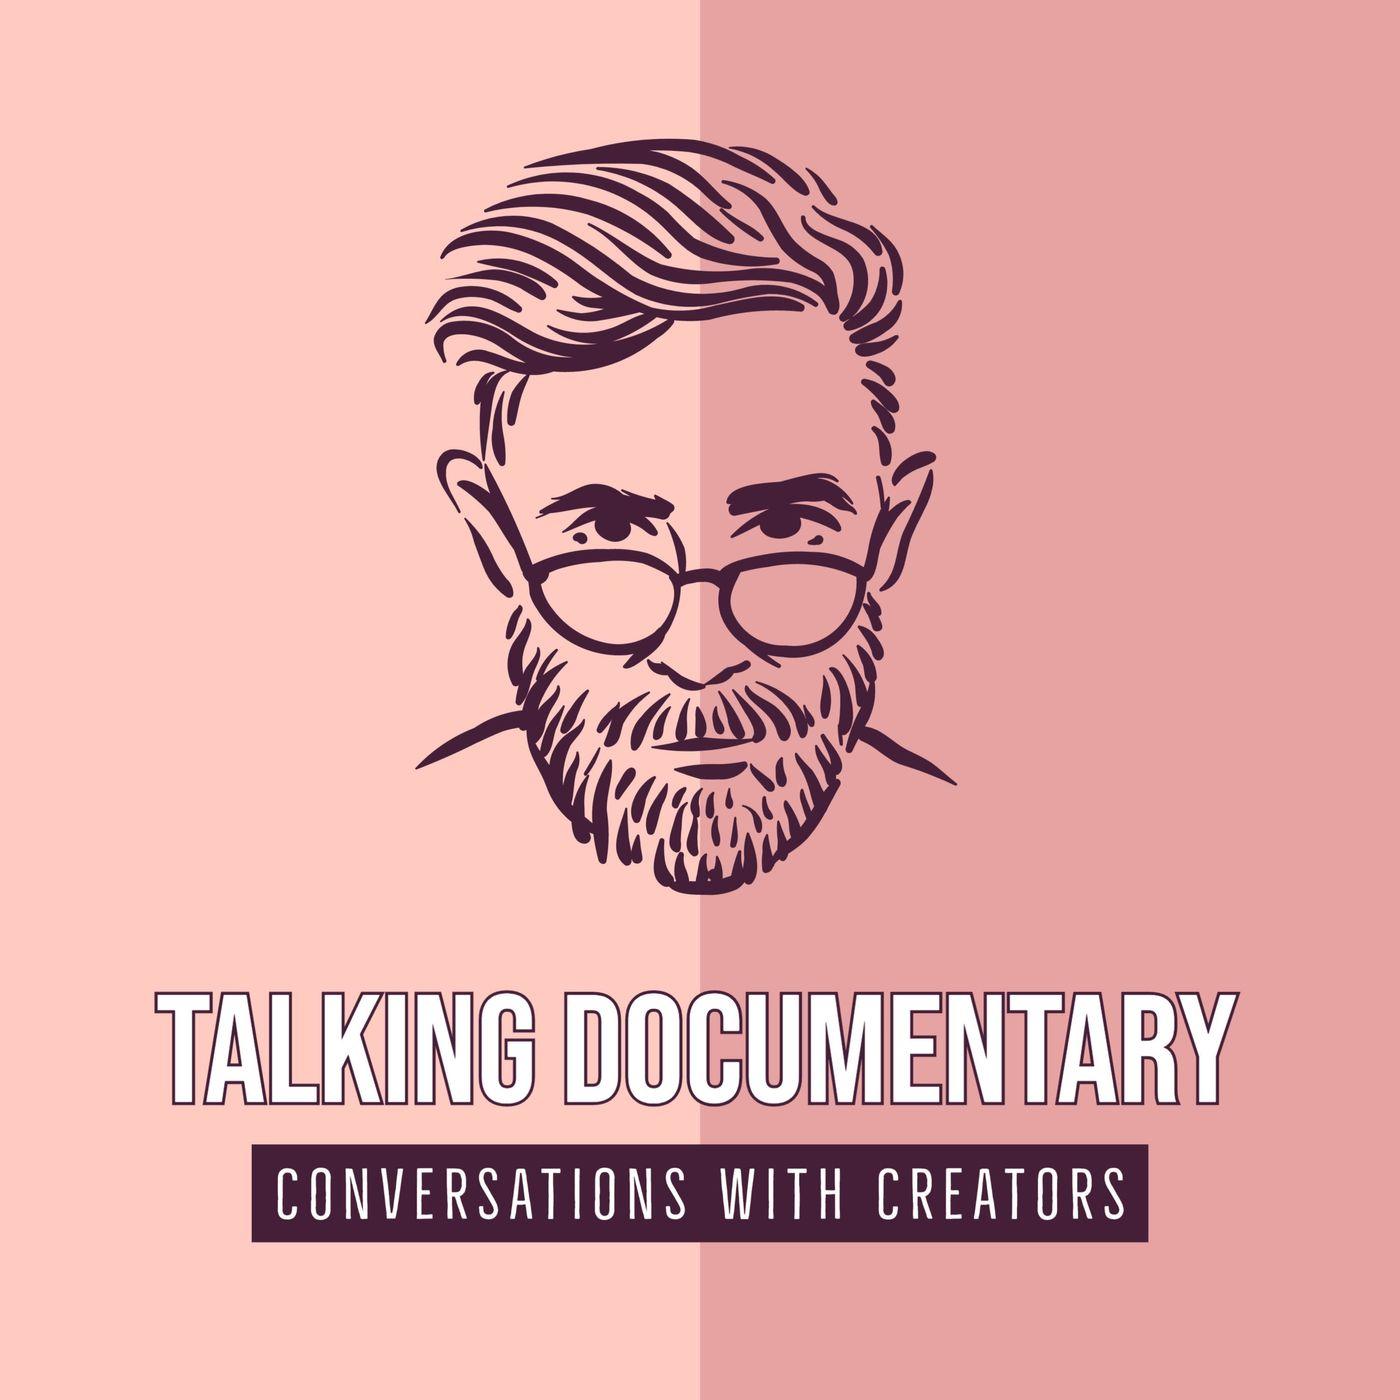 Talking Documentary